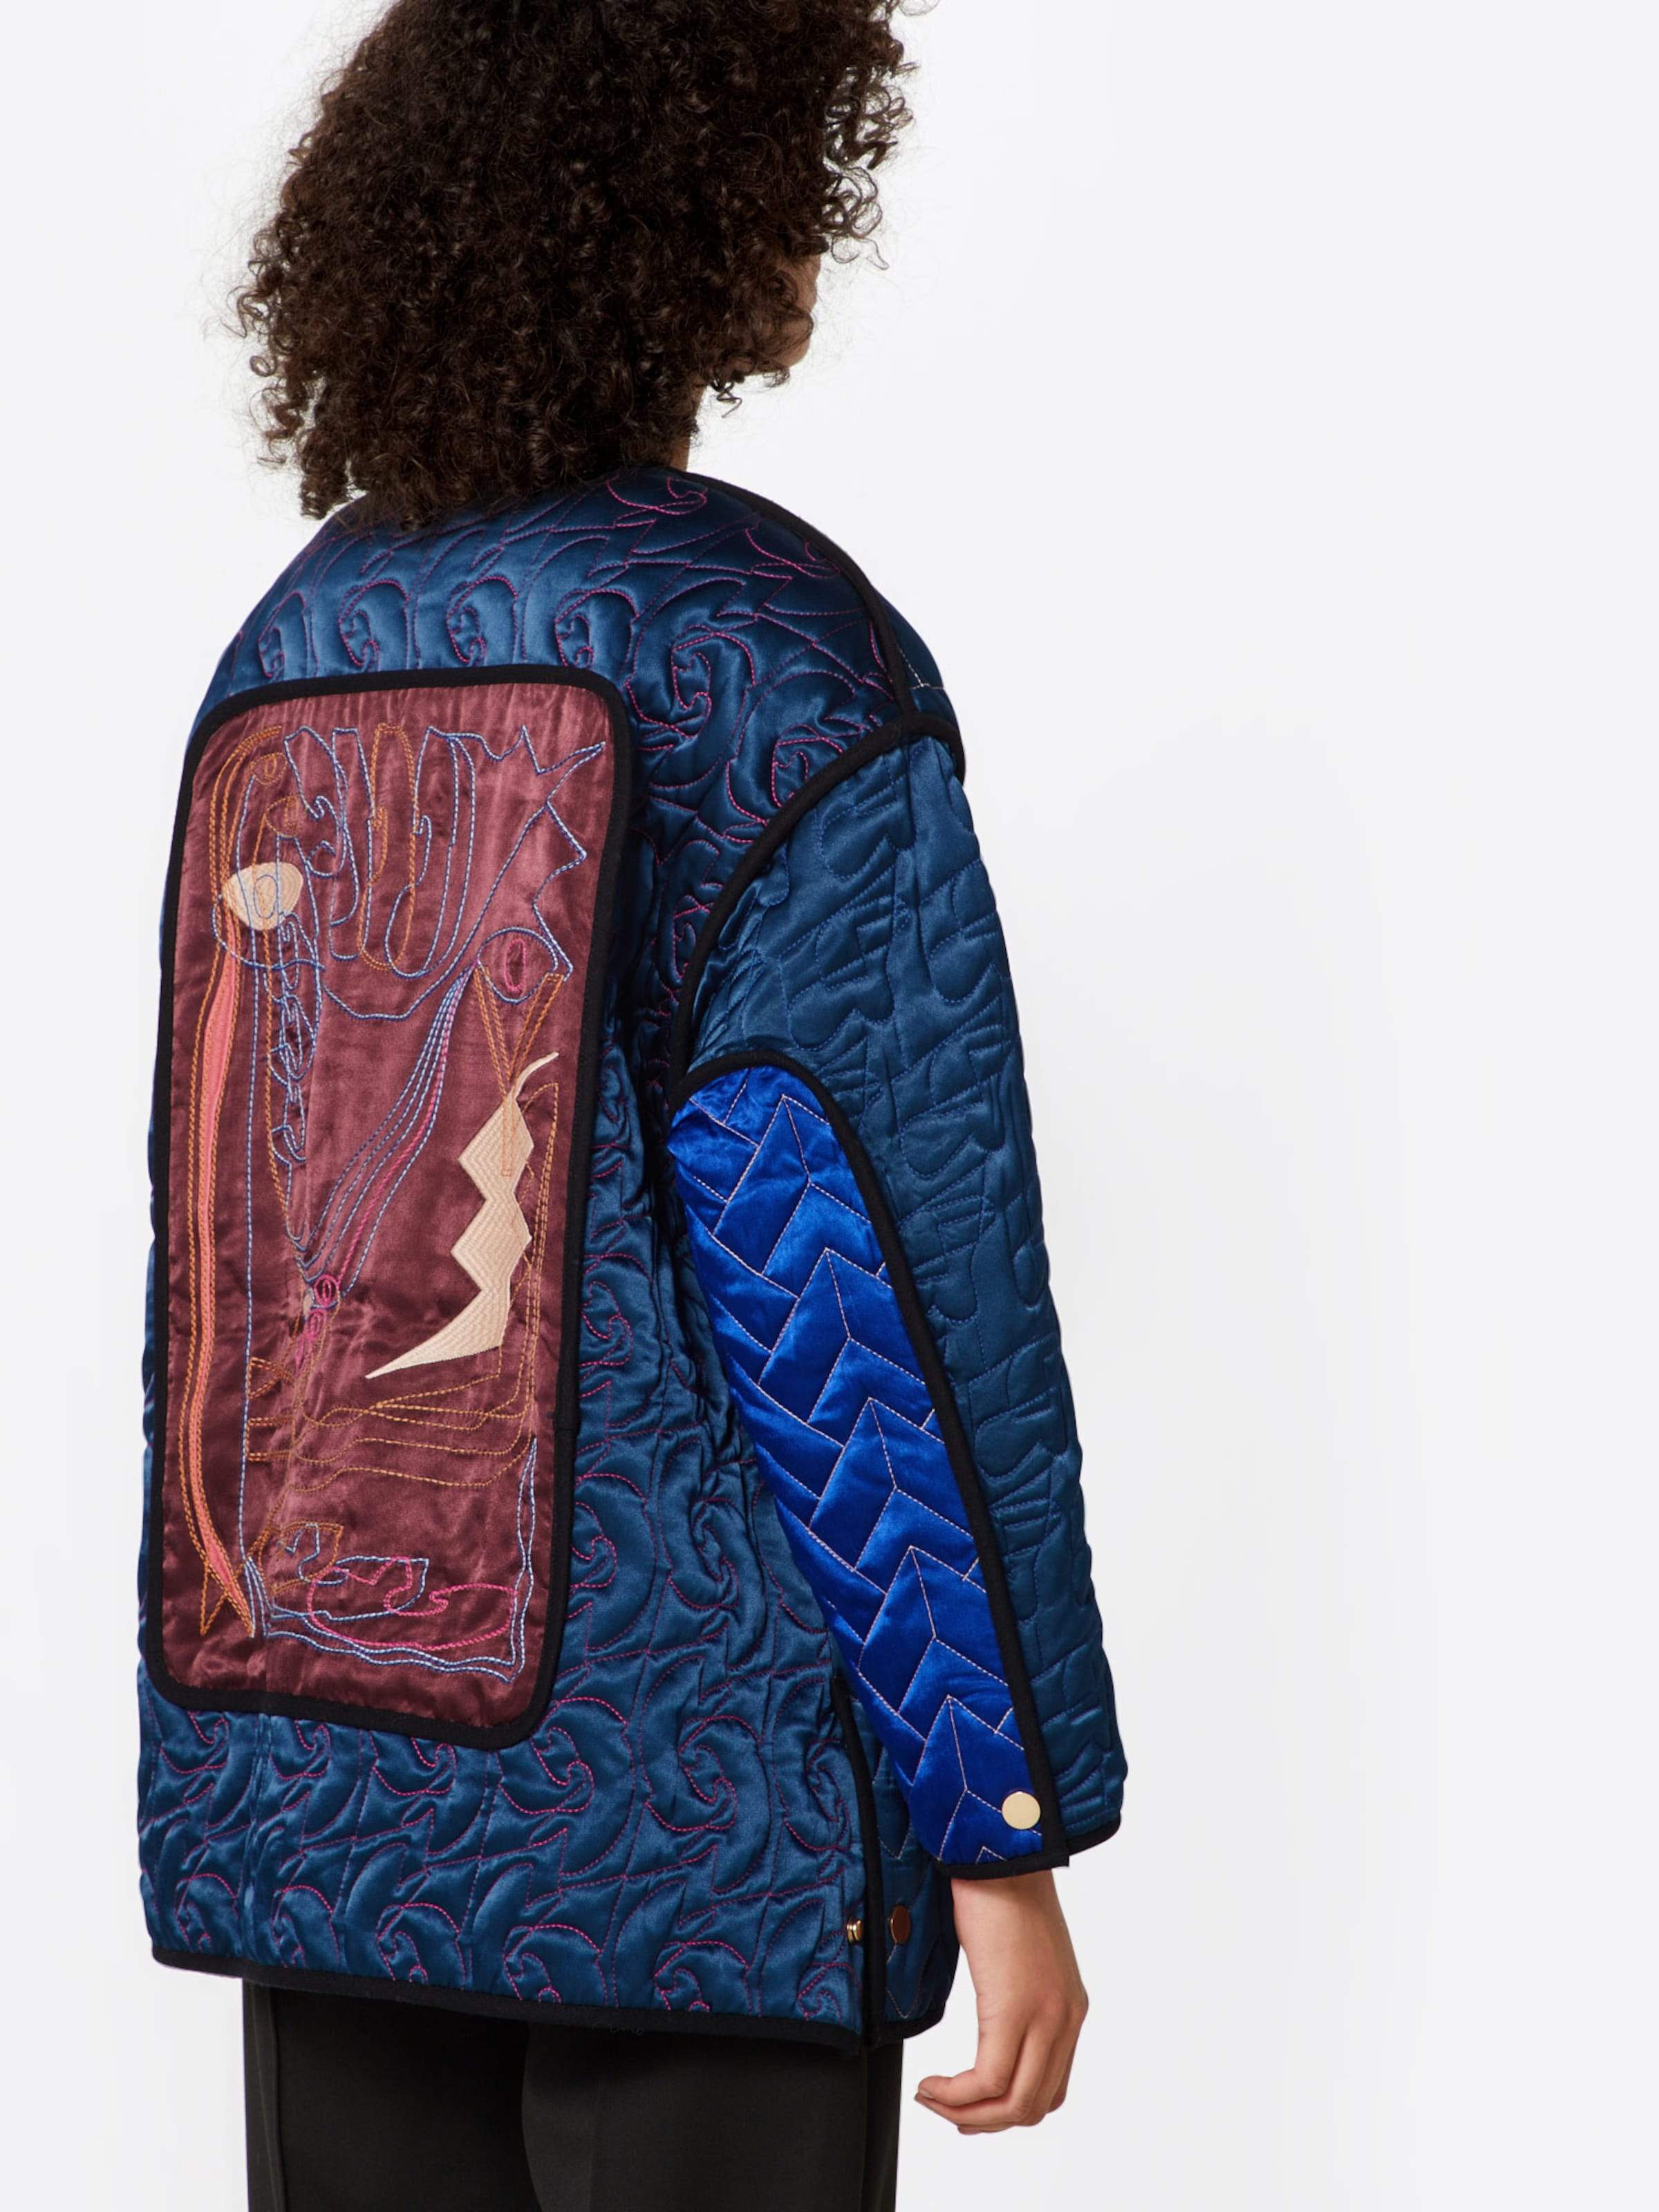 En Postyr Veste BleuRouge saison 'poslotus Jacket' Mi Quilt 76yYbfg